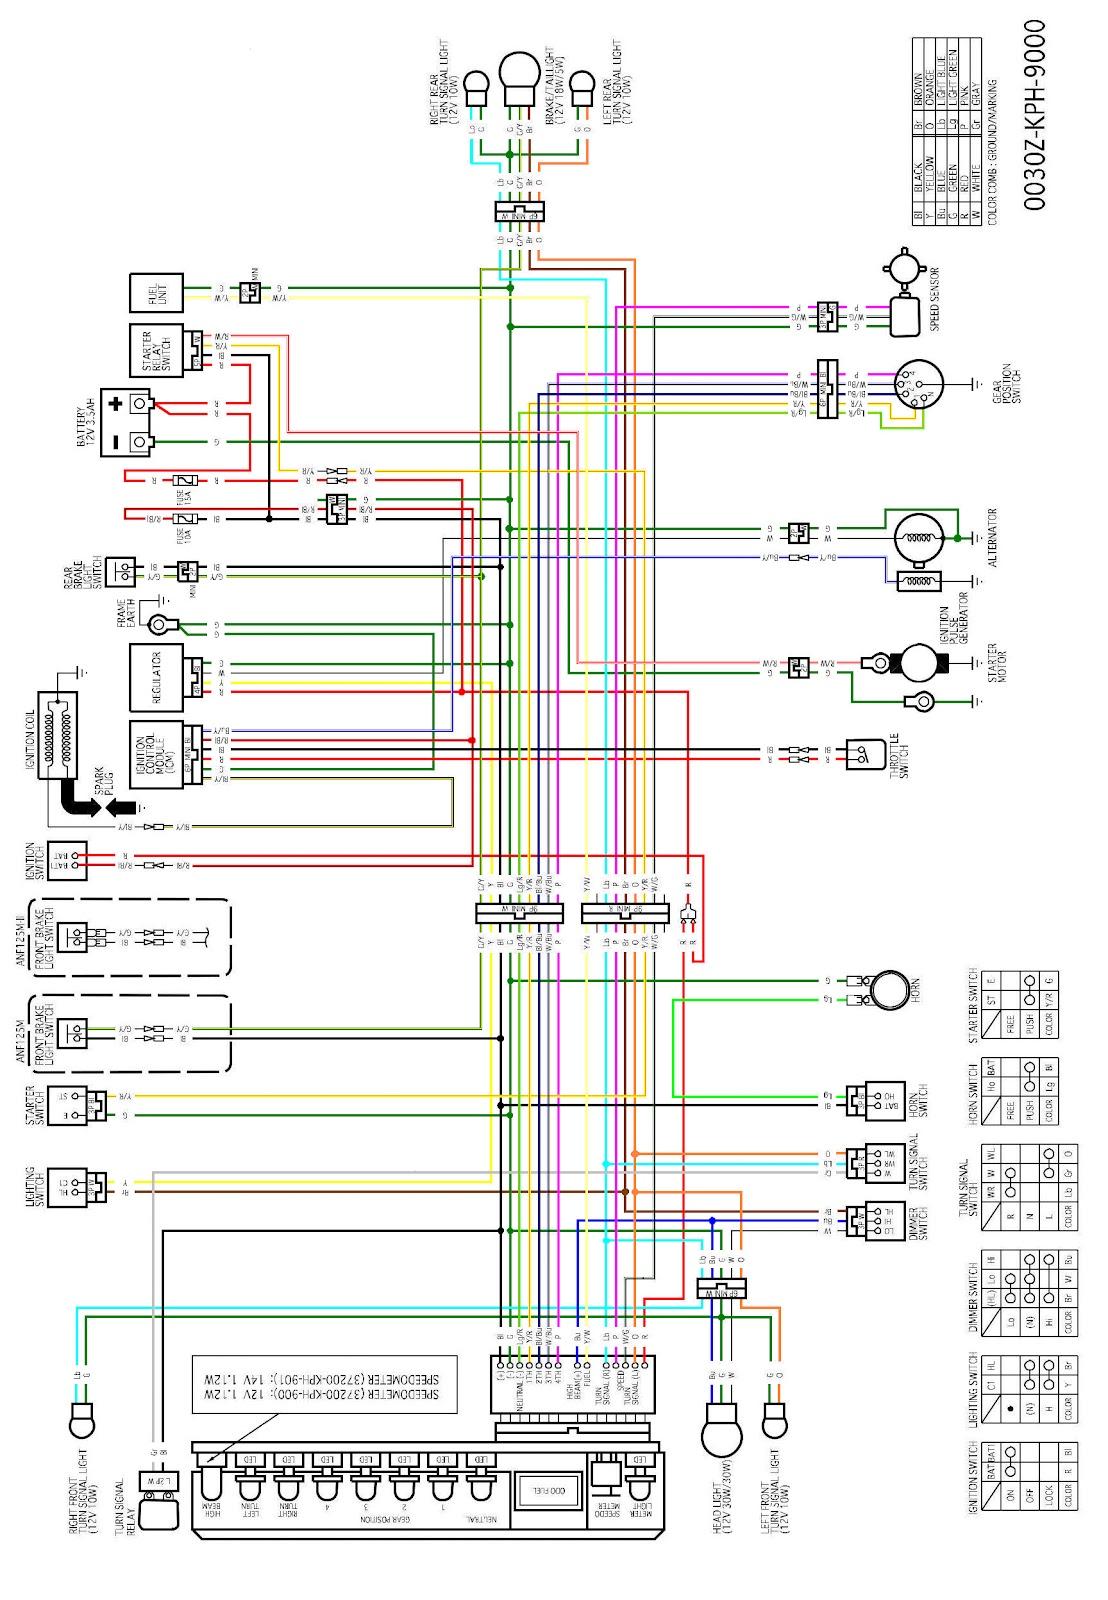 Kumpulan gambar wiring diagram sepeda motor terbaru codot modifikasi suara mekanik motor 2012 cheapraybanclubmaster Gallery